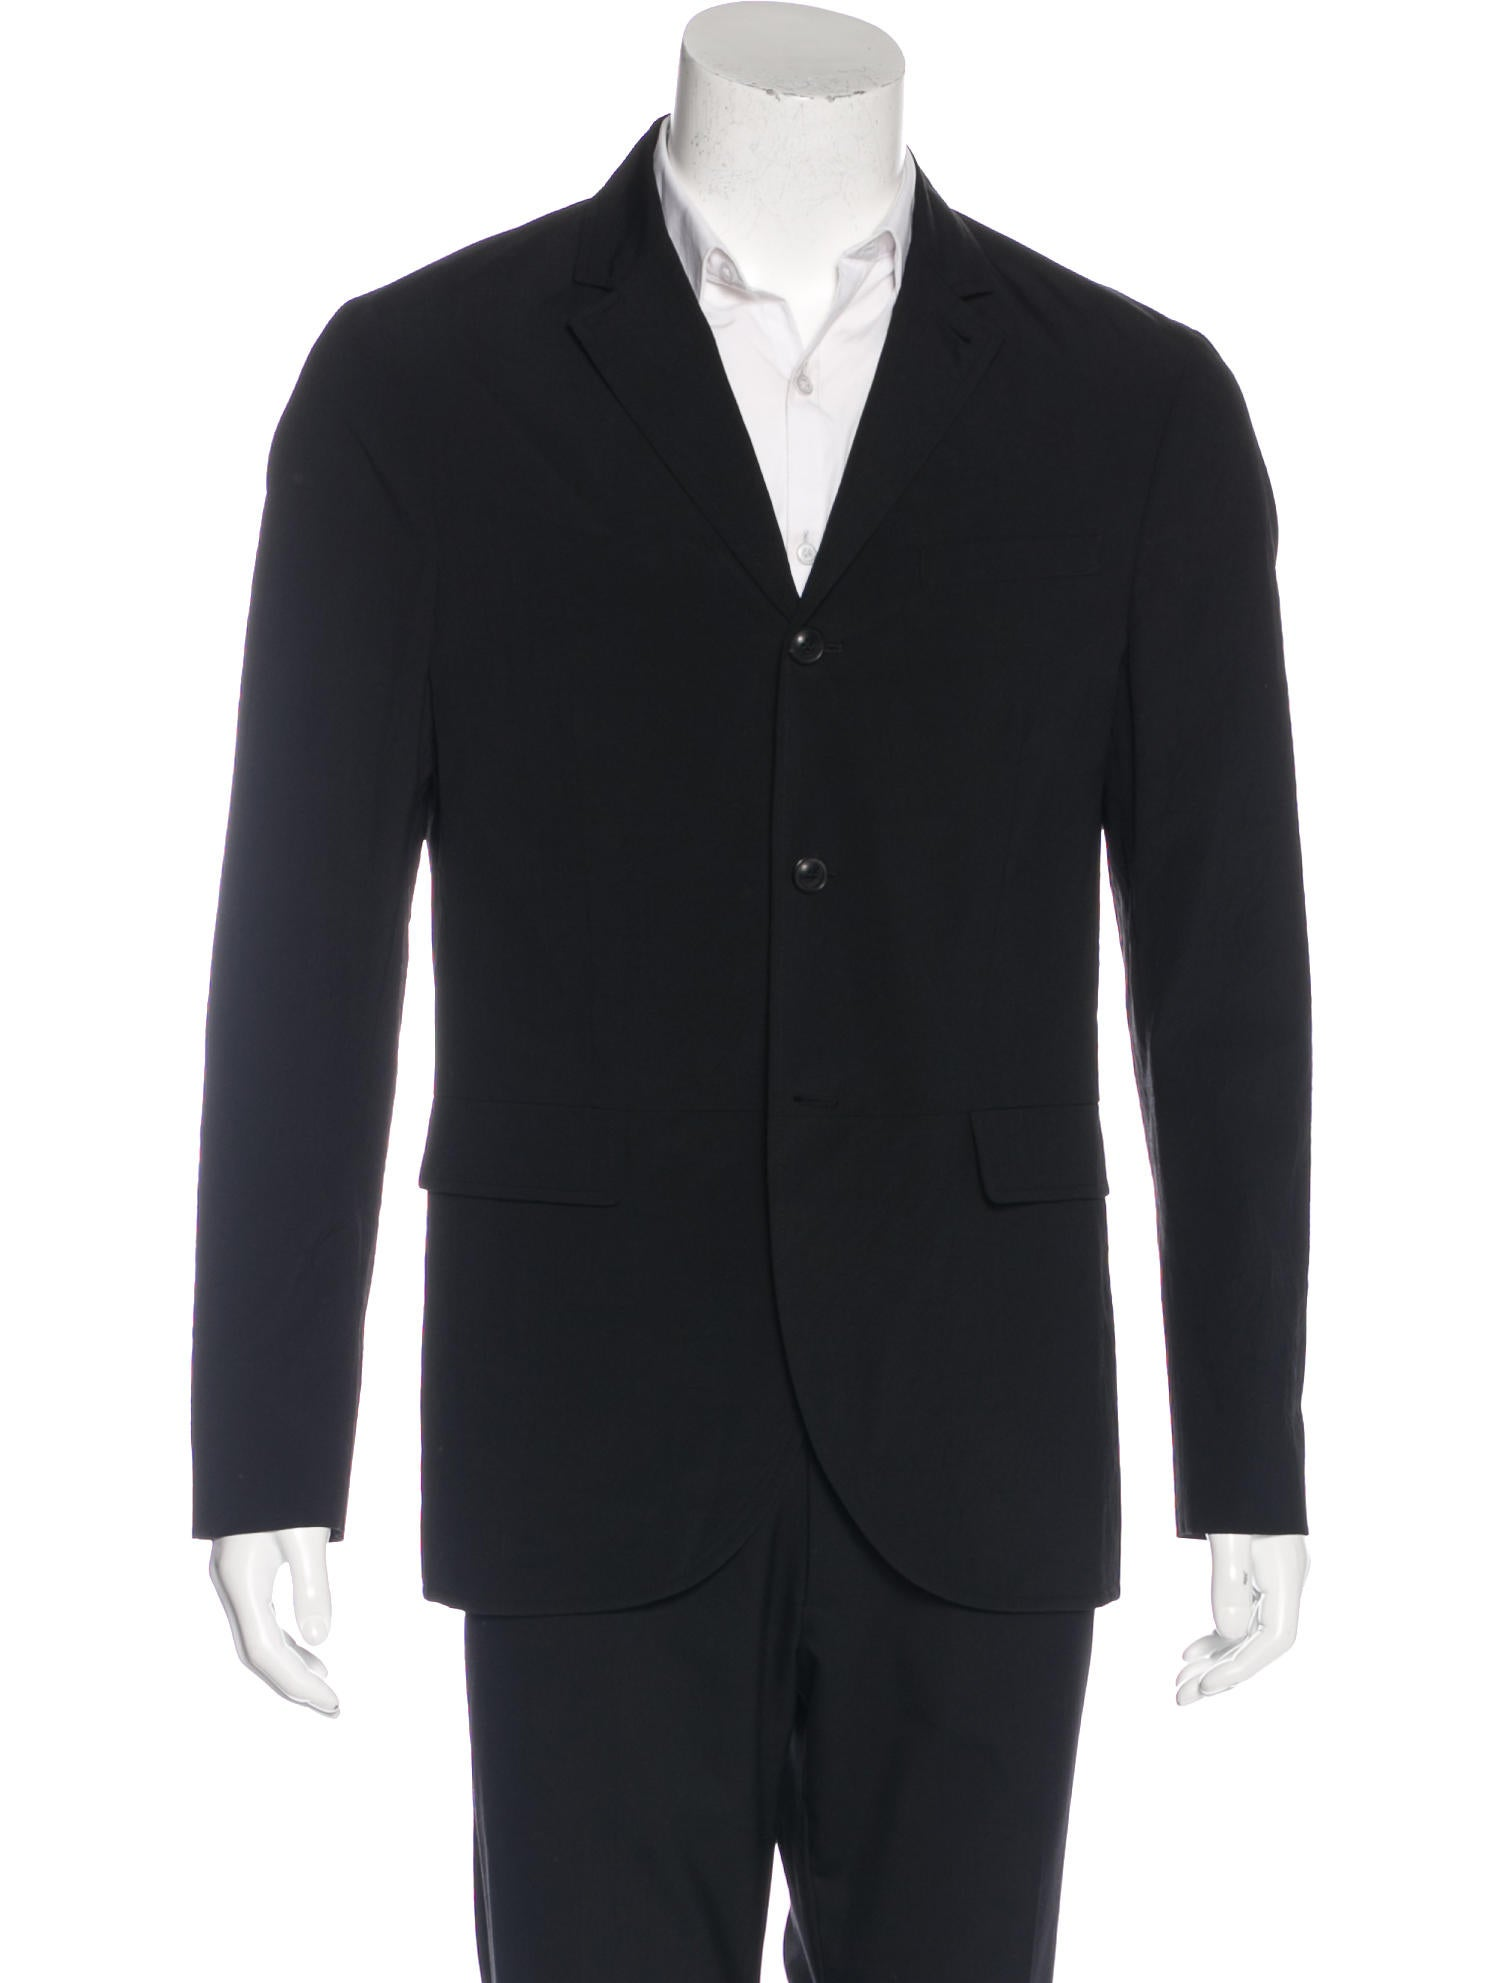 Blazers & Sport Coats Back to Men; Apply. Filter By clear all. Free Pick Up In Store Clear. Offers Lauren Ralph Lauren Men's Classic-Fit Ultraflex Stretch Black/White Herringbone Wool Sport Coat.